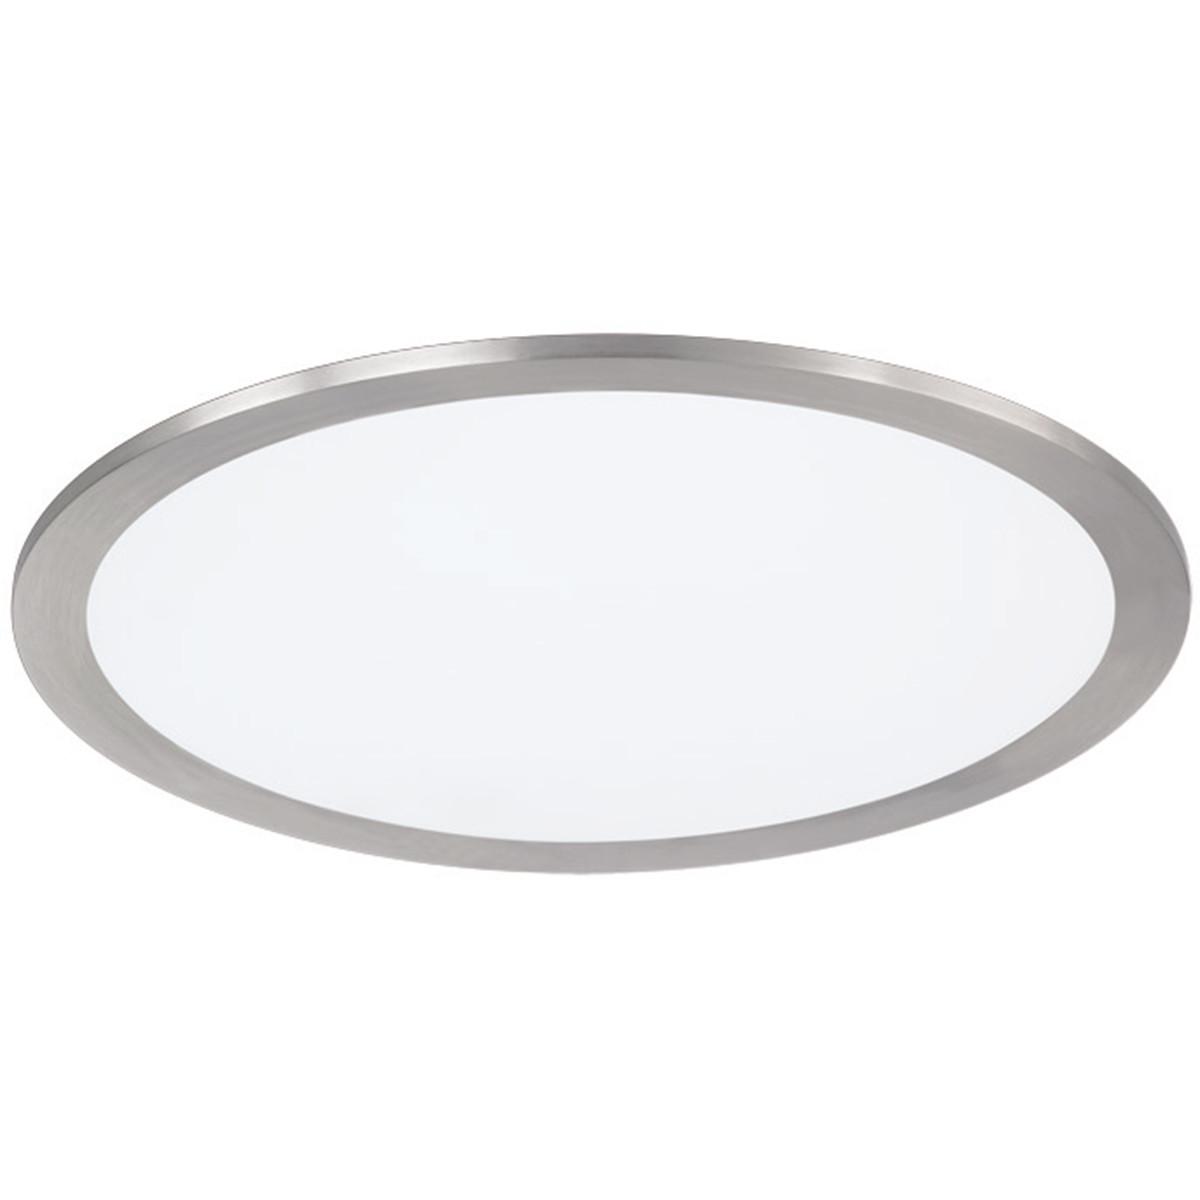 LED Plafondlamp - Plafondverlichting - Trion Povino - 15W - Warm Wit 3000K - Dimbaar - Rond - Mat Ni